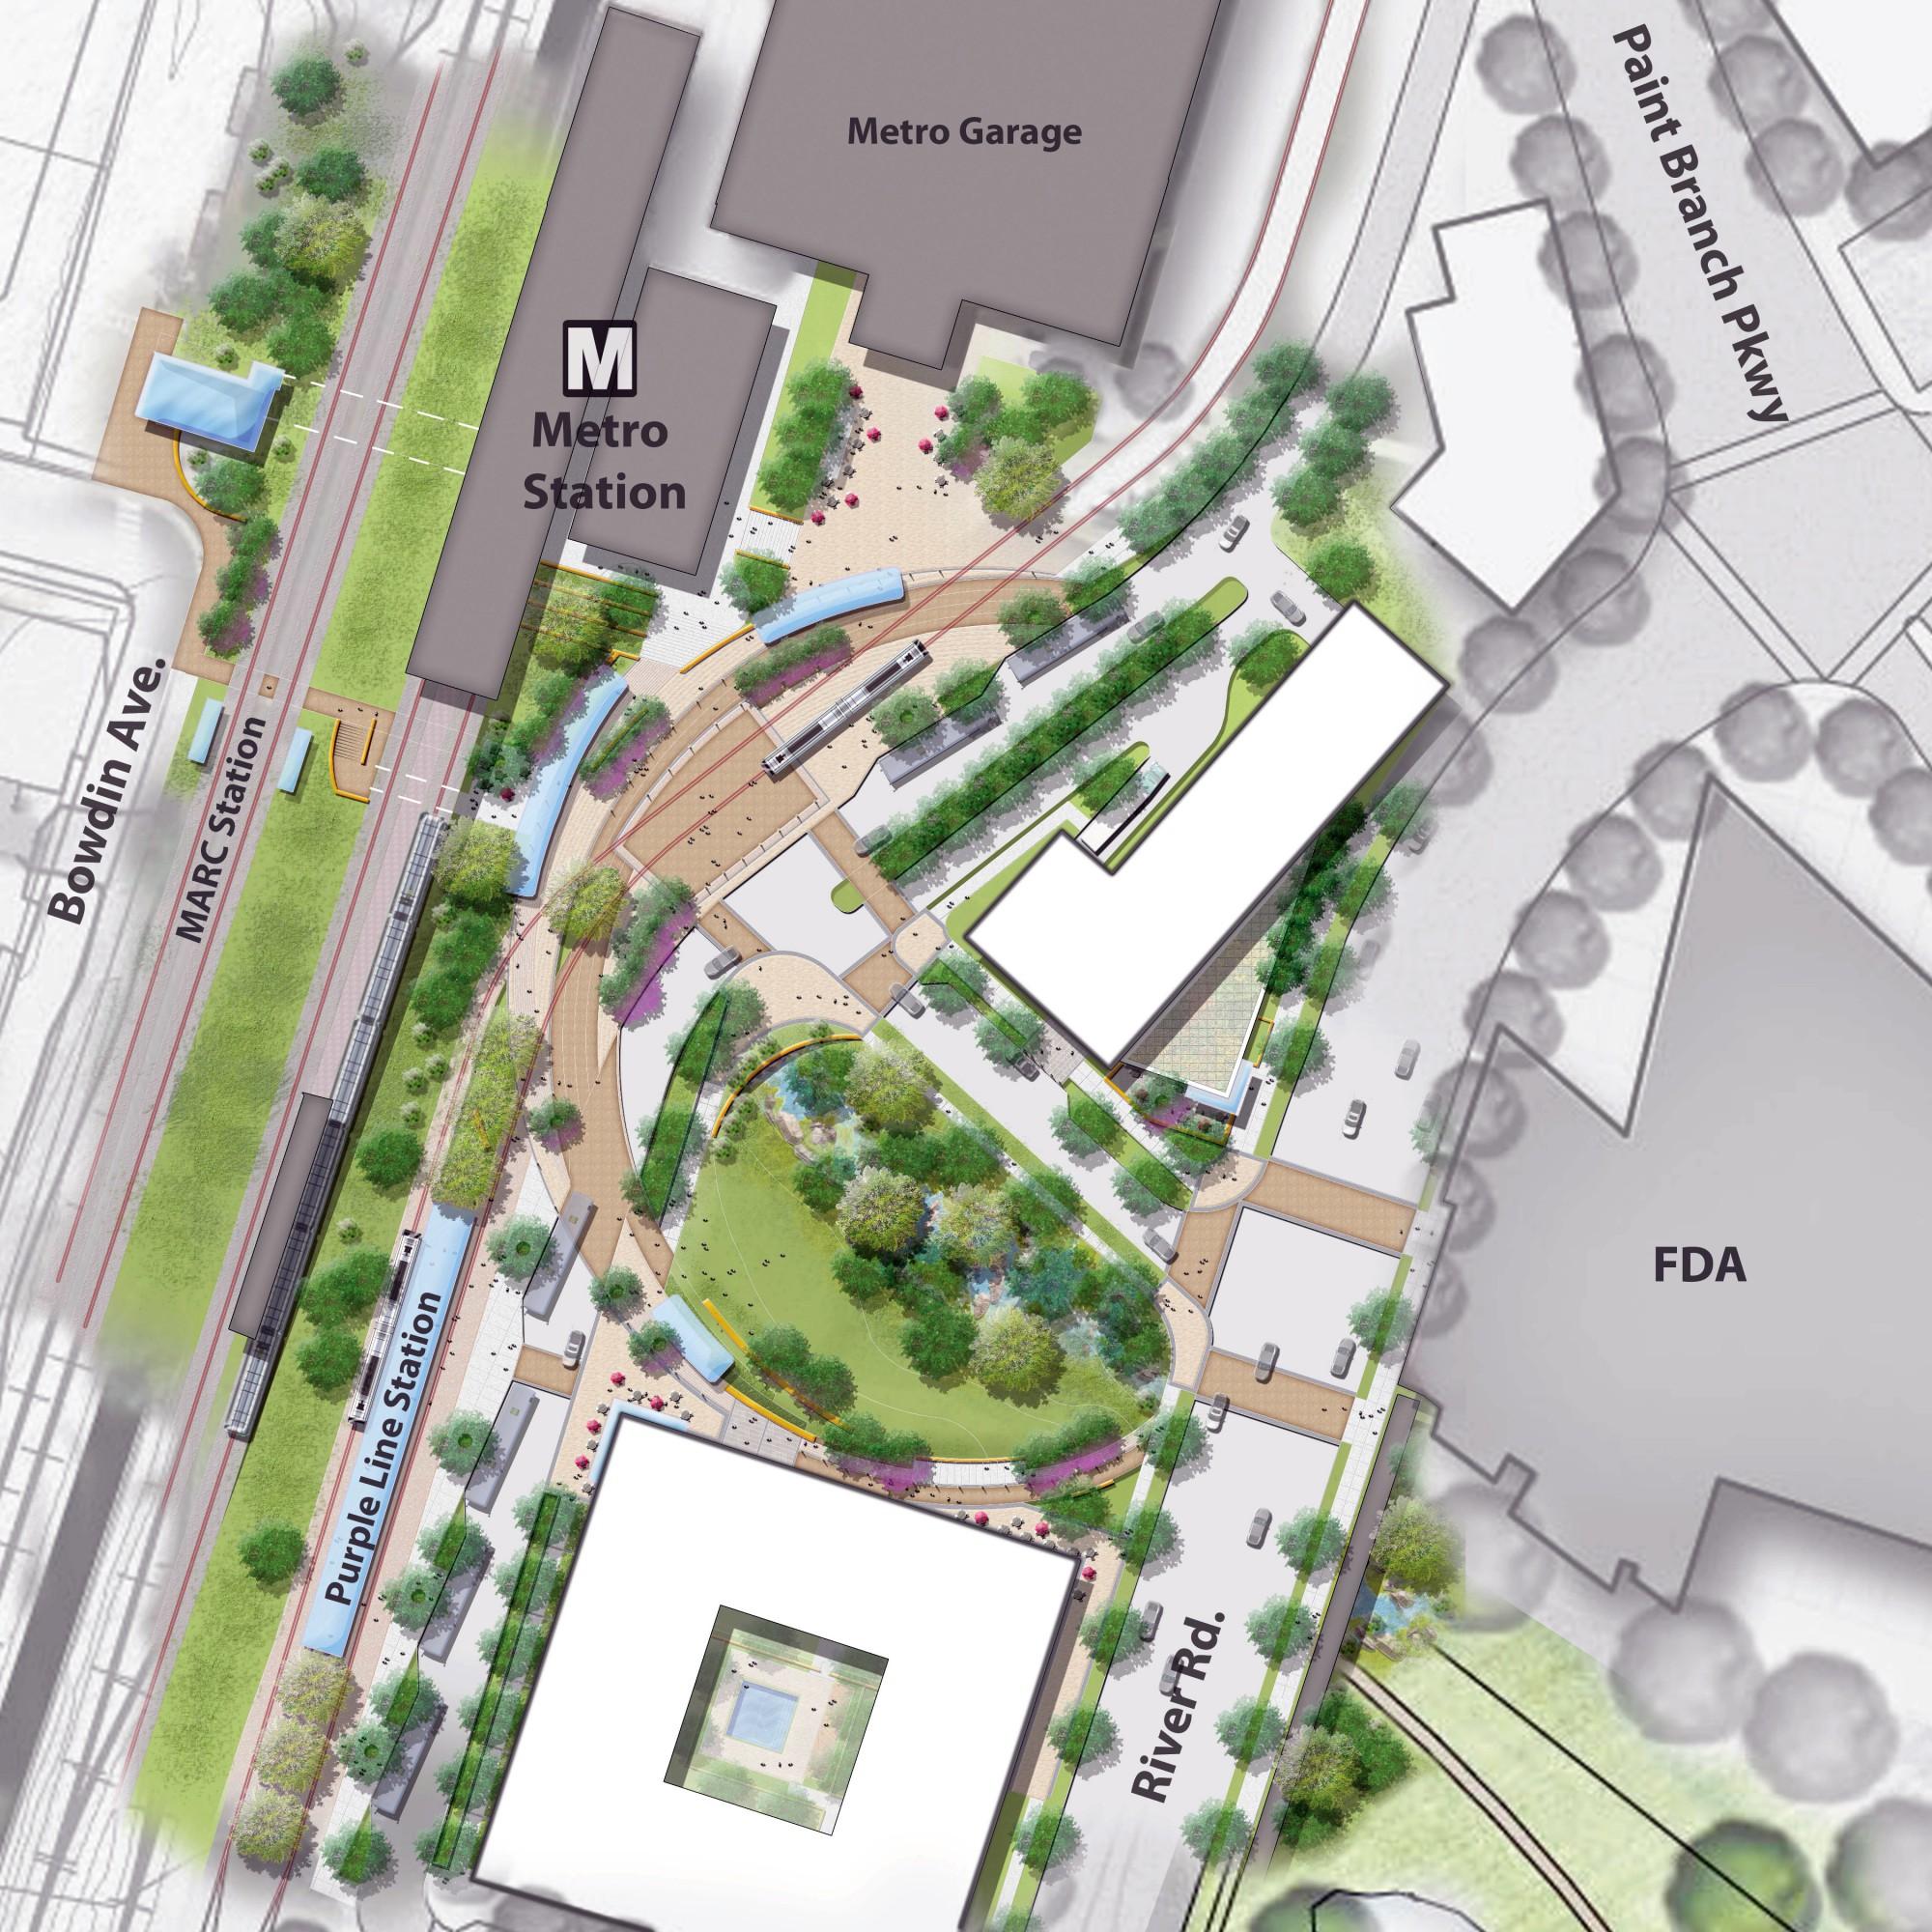 m ncppc college park riverdale park transit district development plan portfolio design. Black Bedroom Furniture Sets. Home Design Ideas